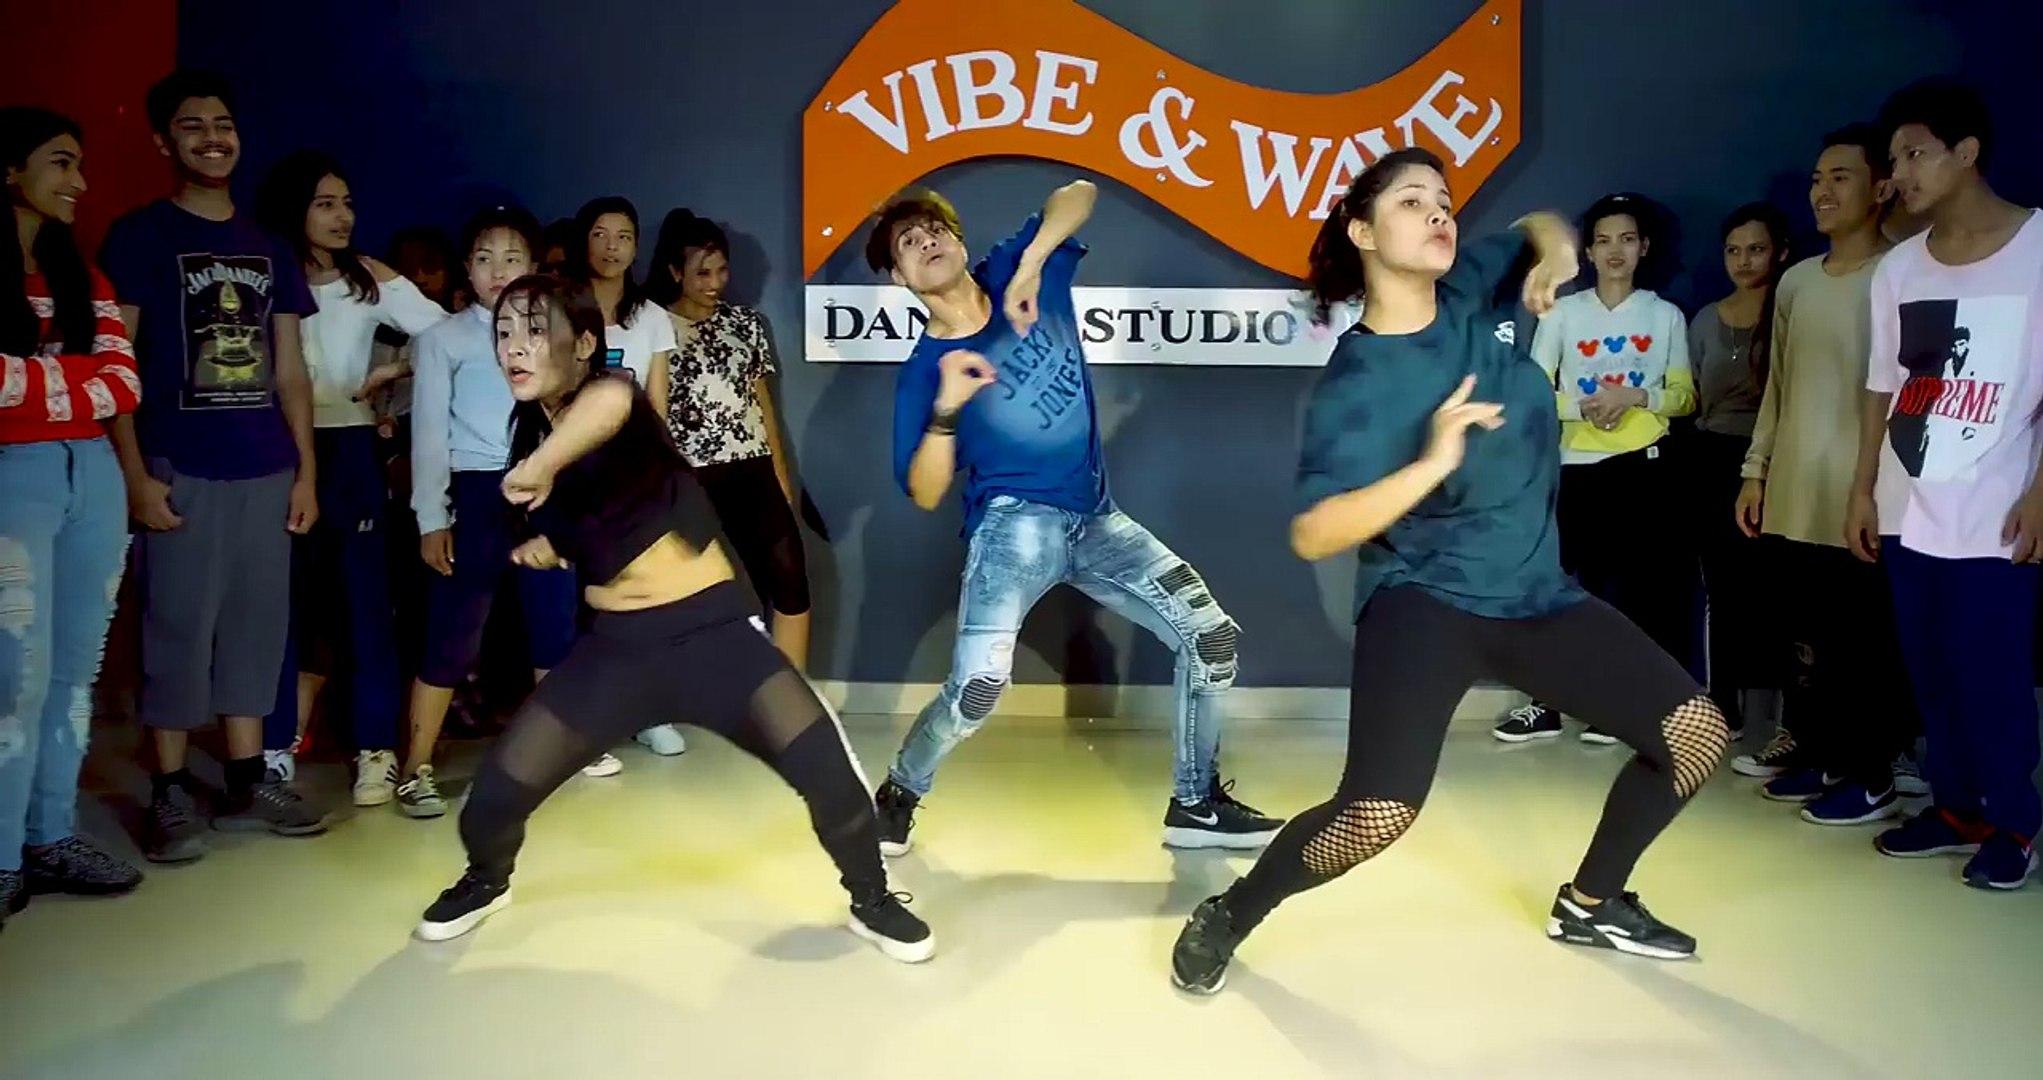 Anabel Alonso Hot 'dame tu cosita' el chombo - dance - choreographyrahul shah